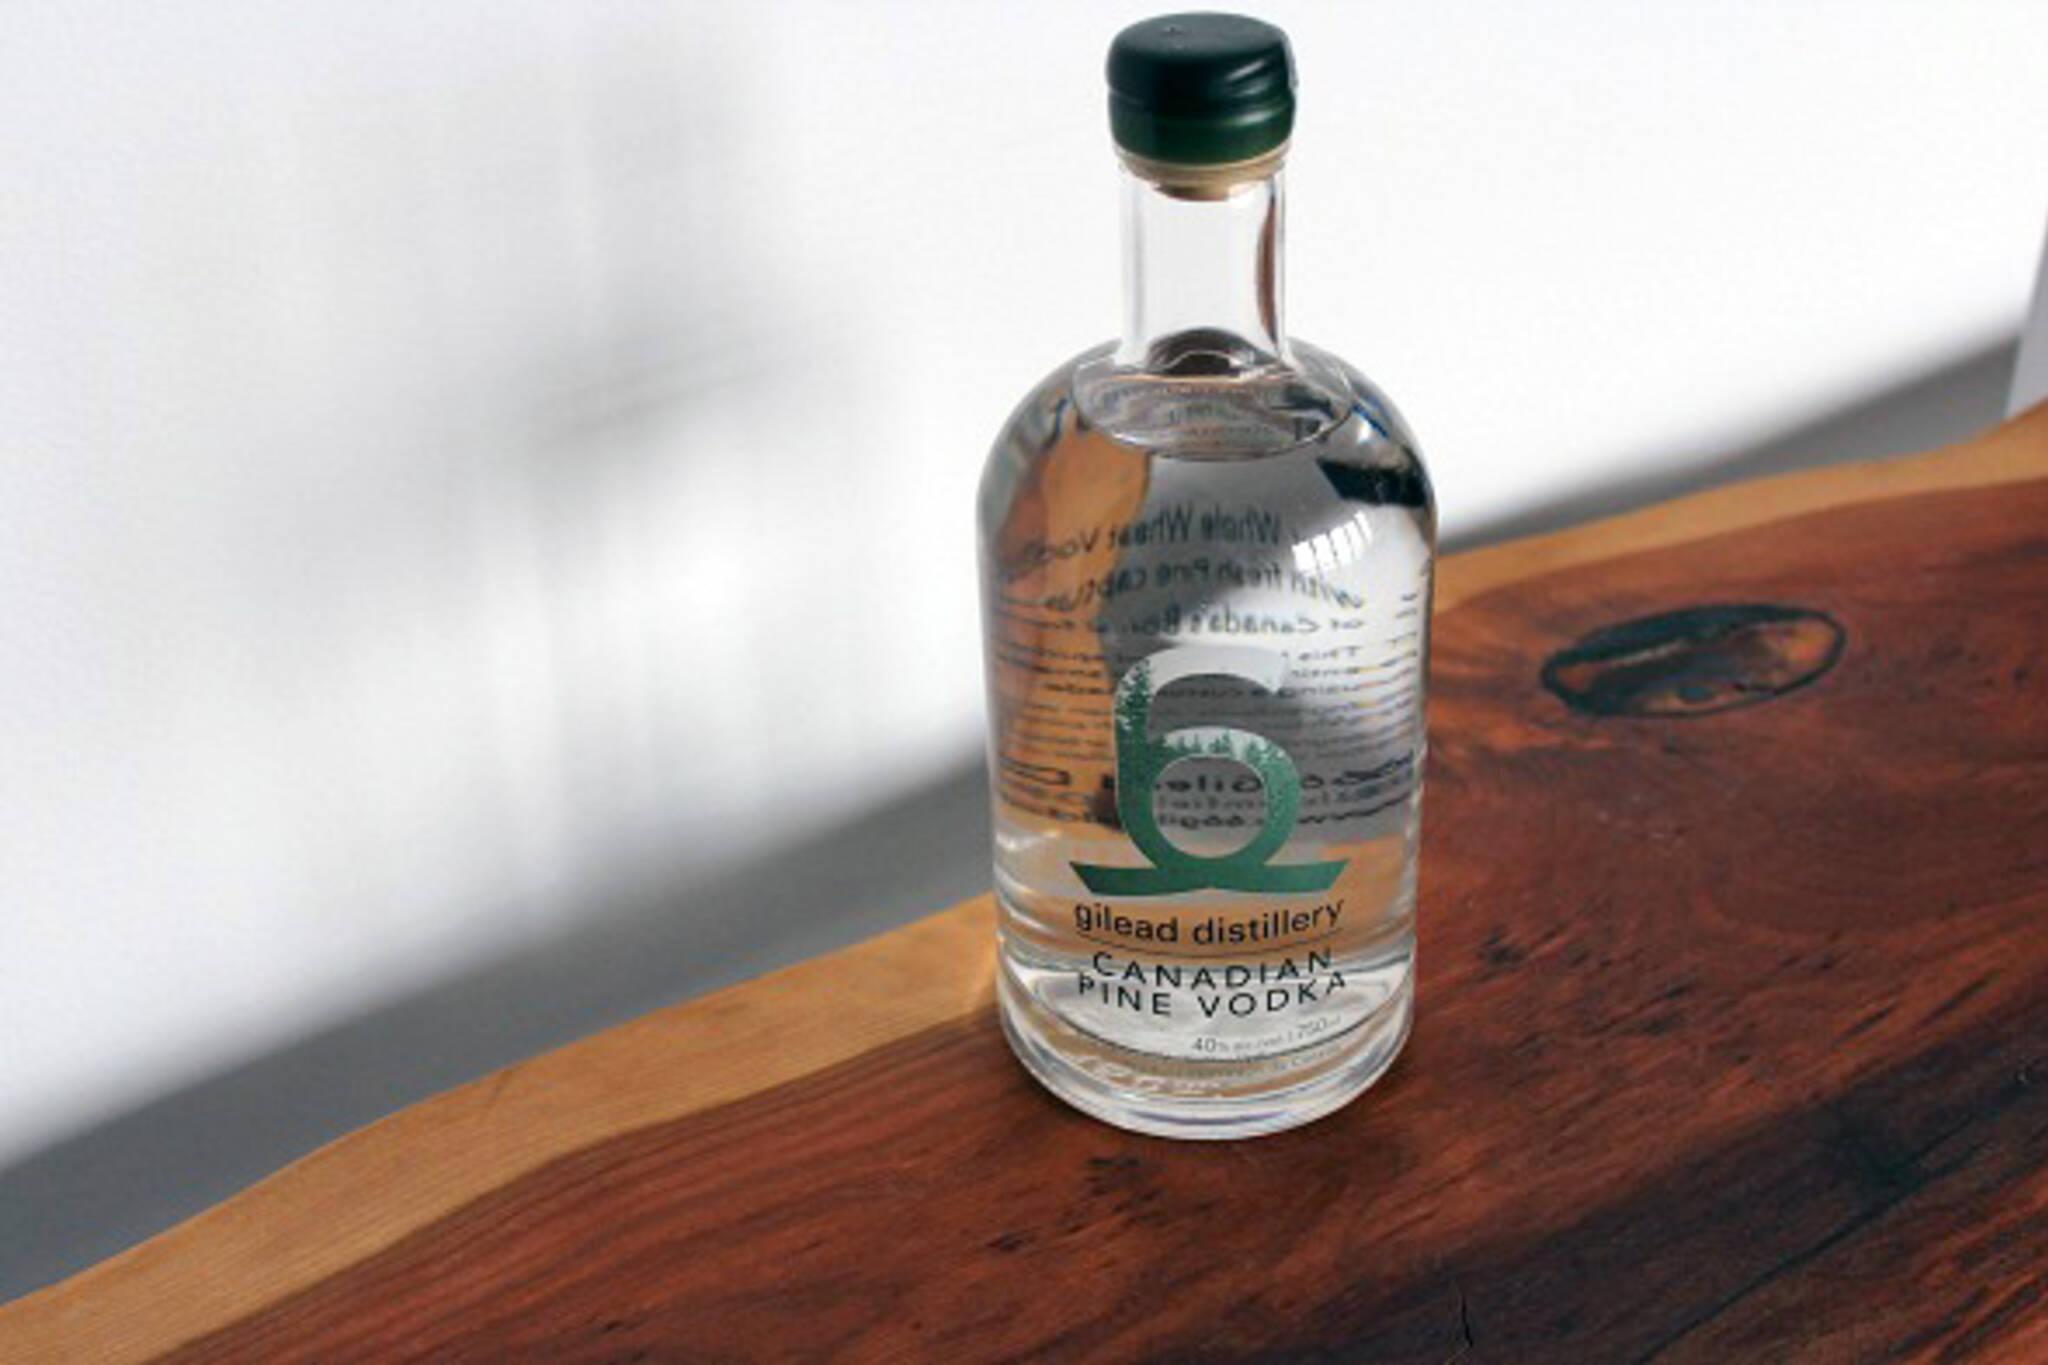 66 Gilead Distillers